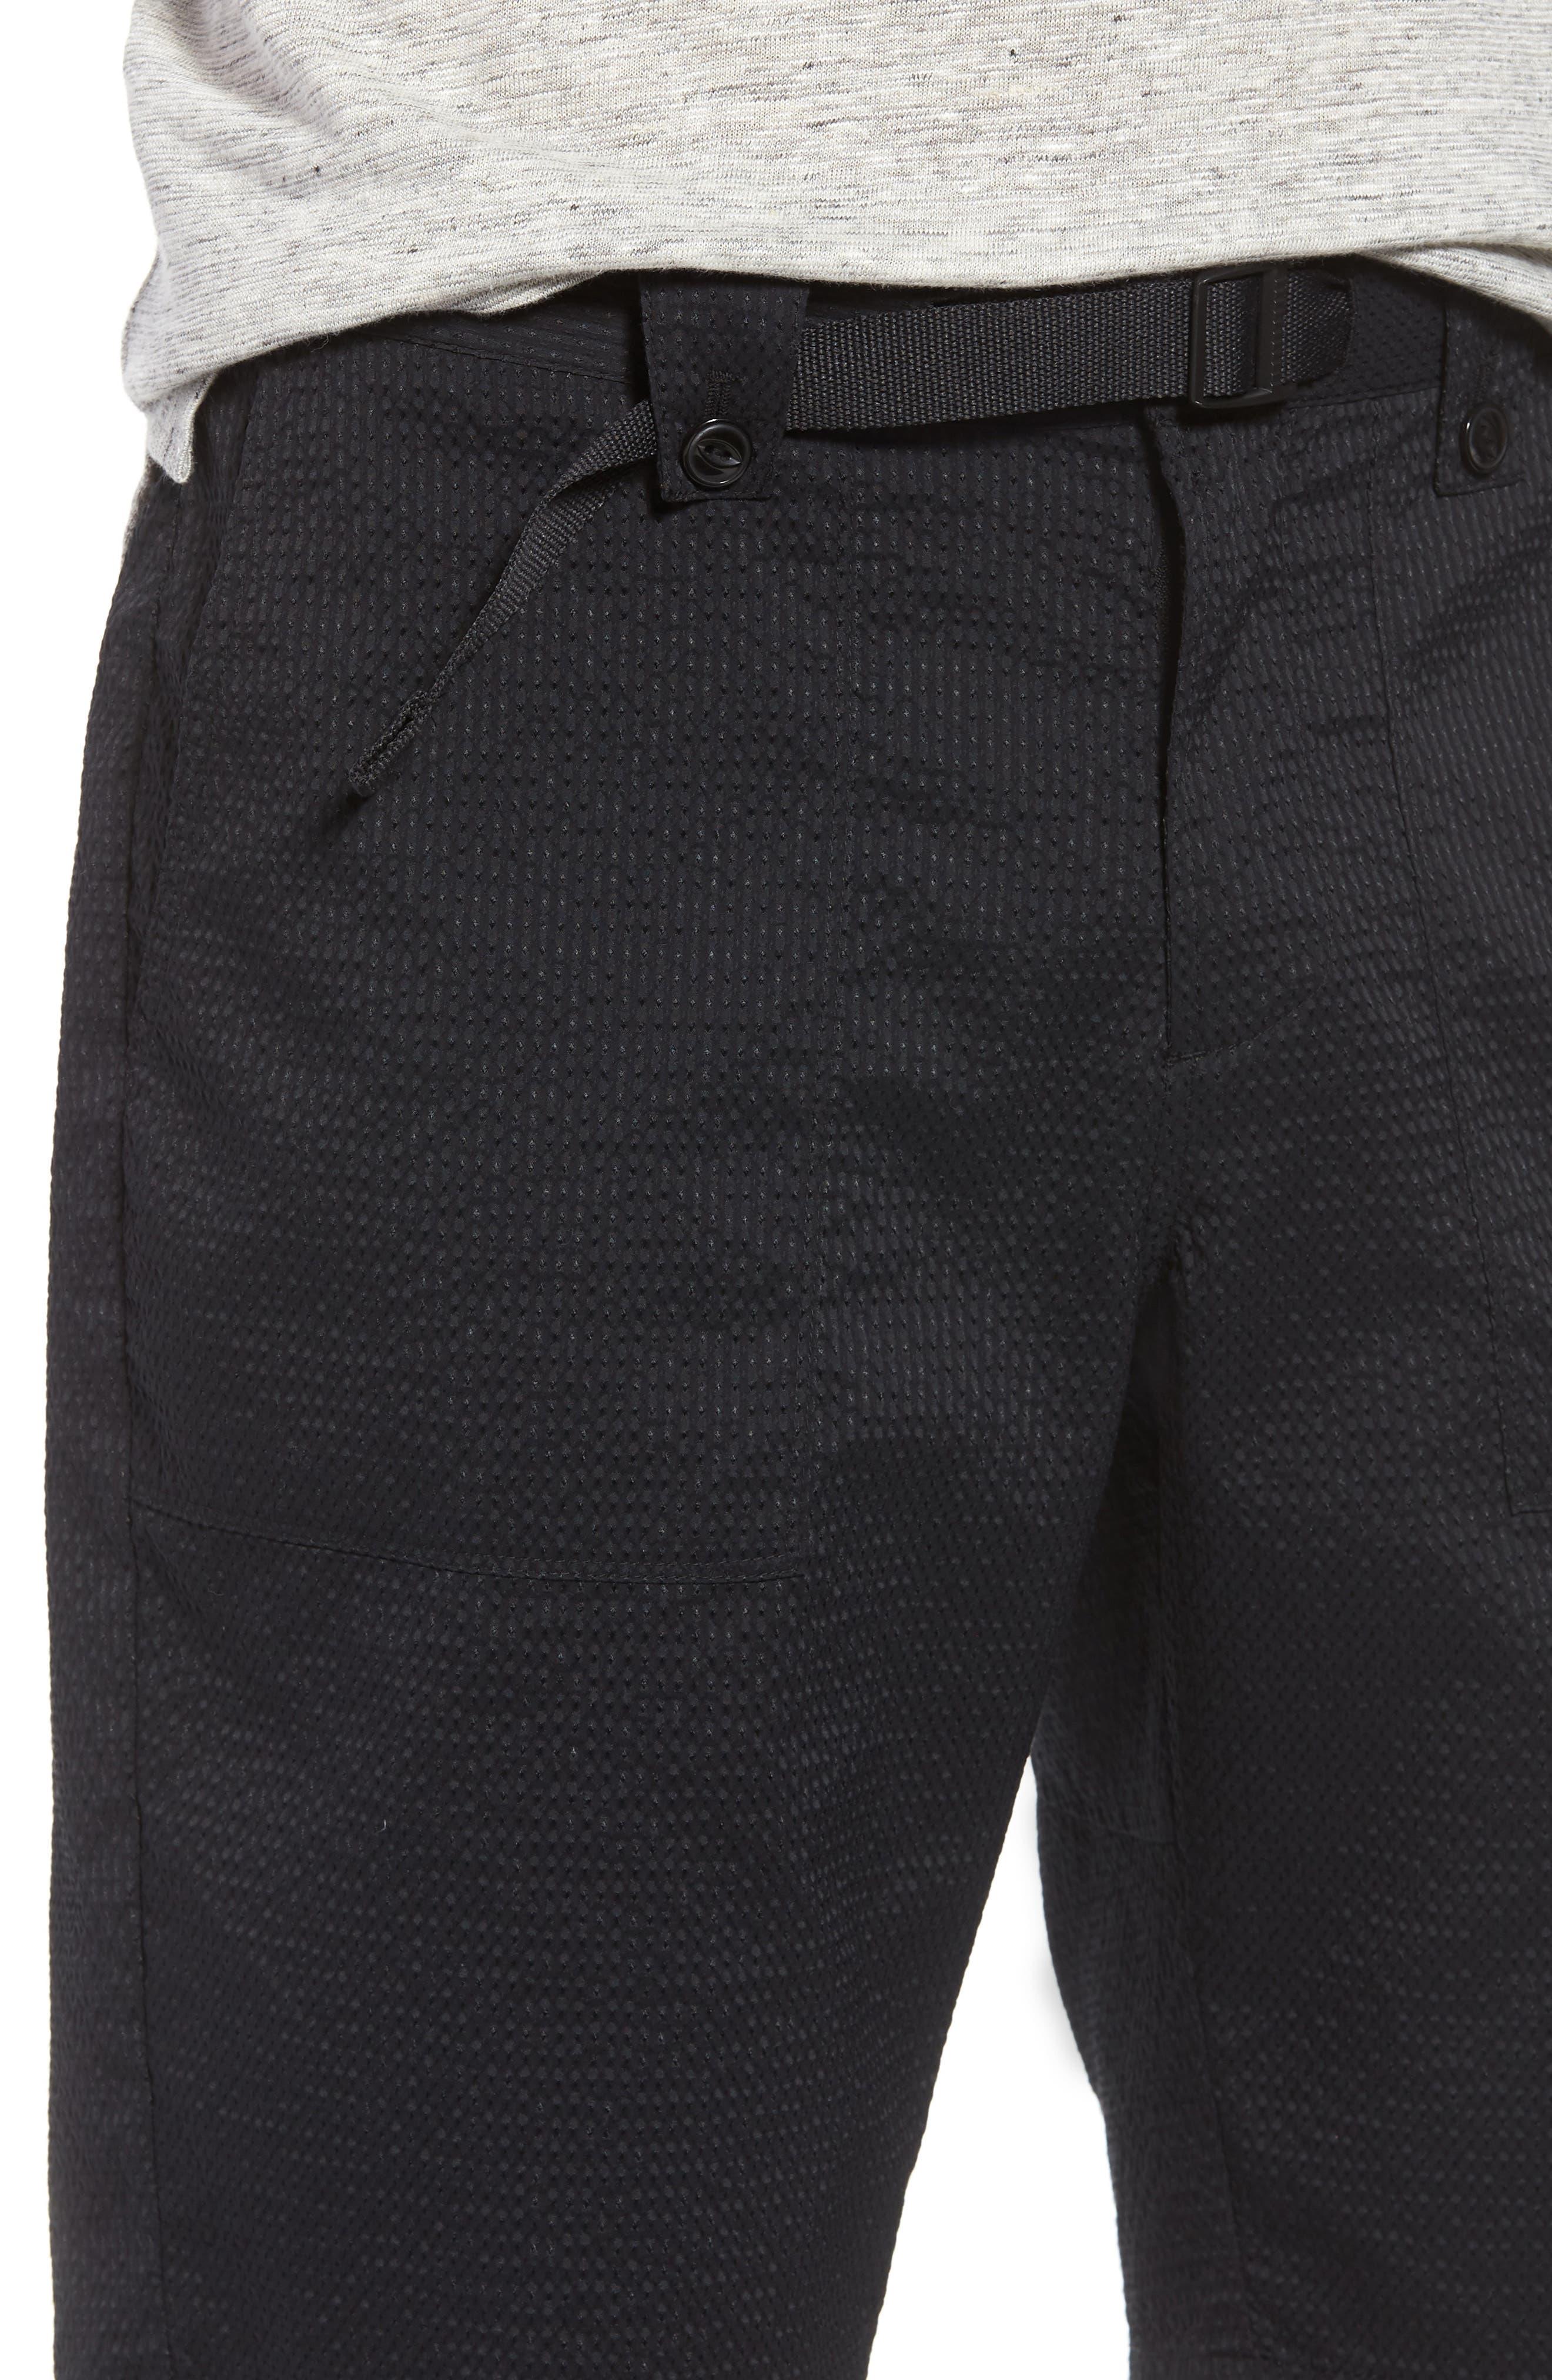 Utility Seersucker Shorts,                             Alternate thumbnail 4, color,                             Black Seersucker